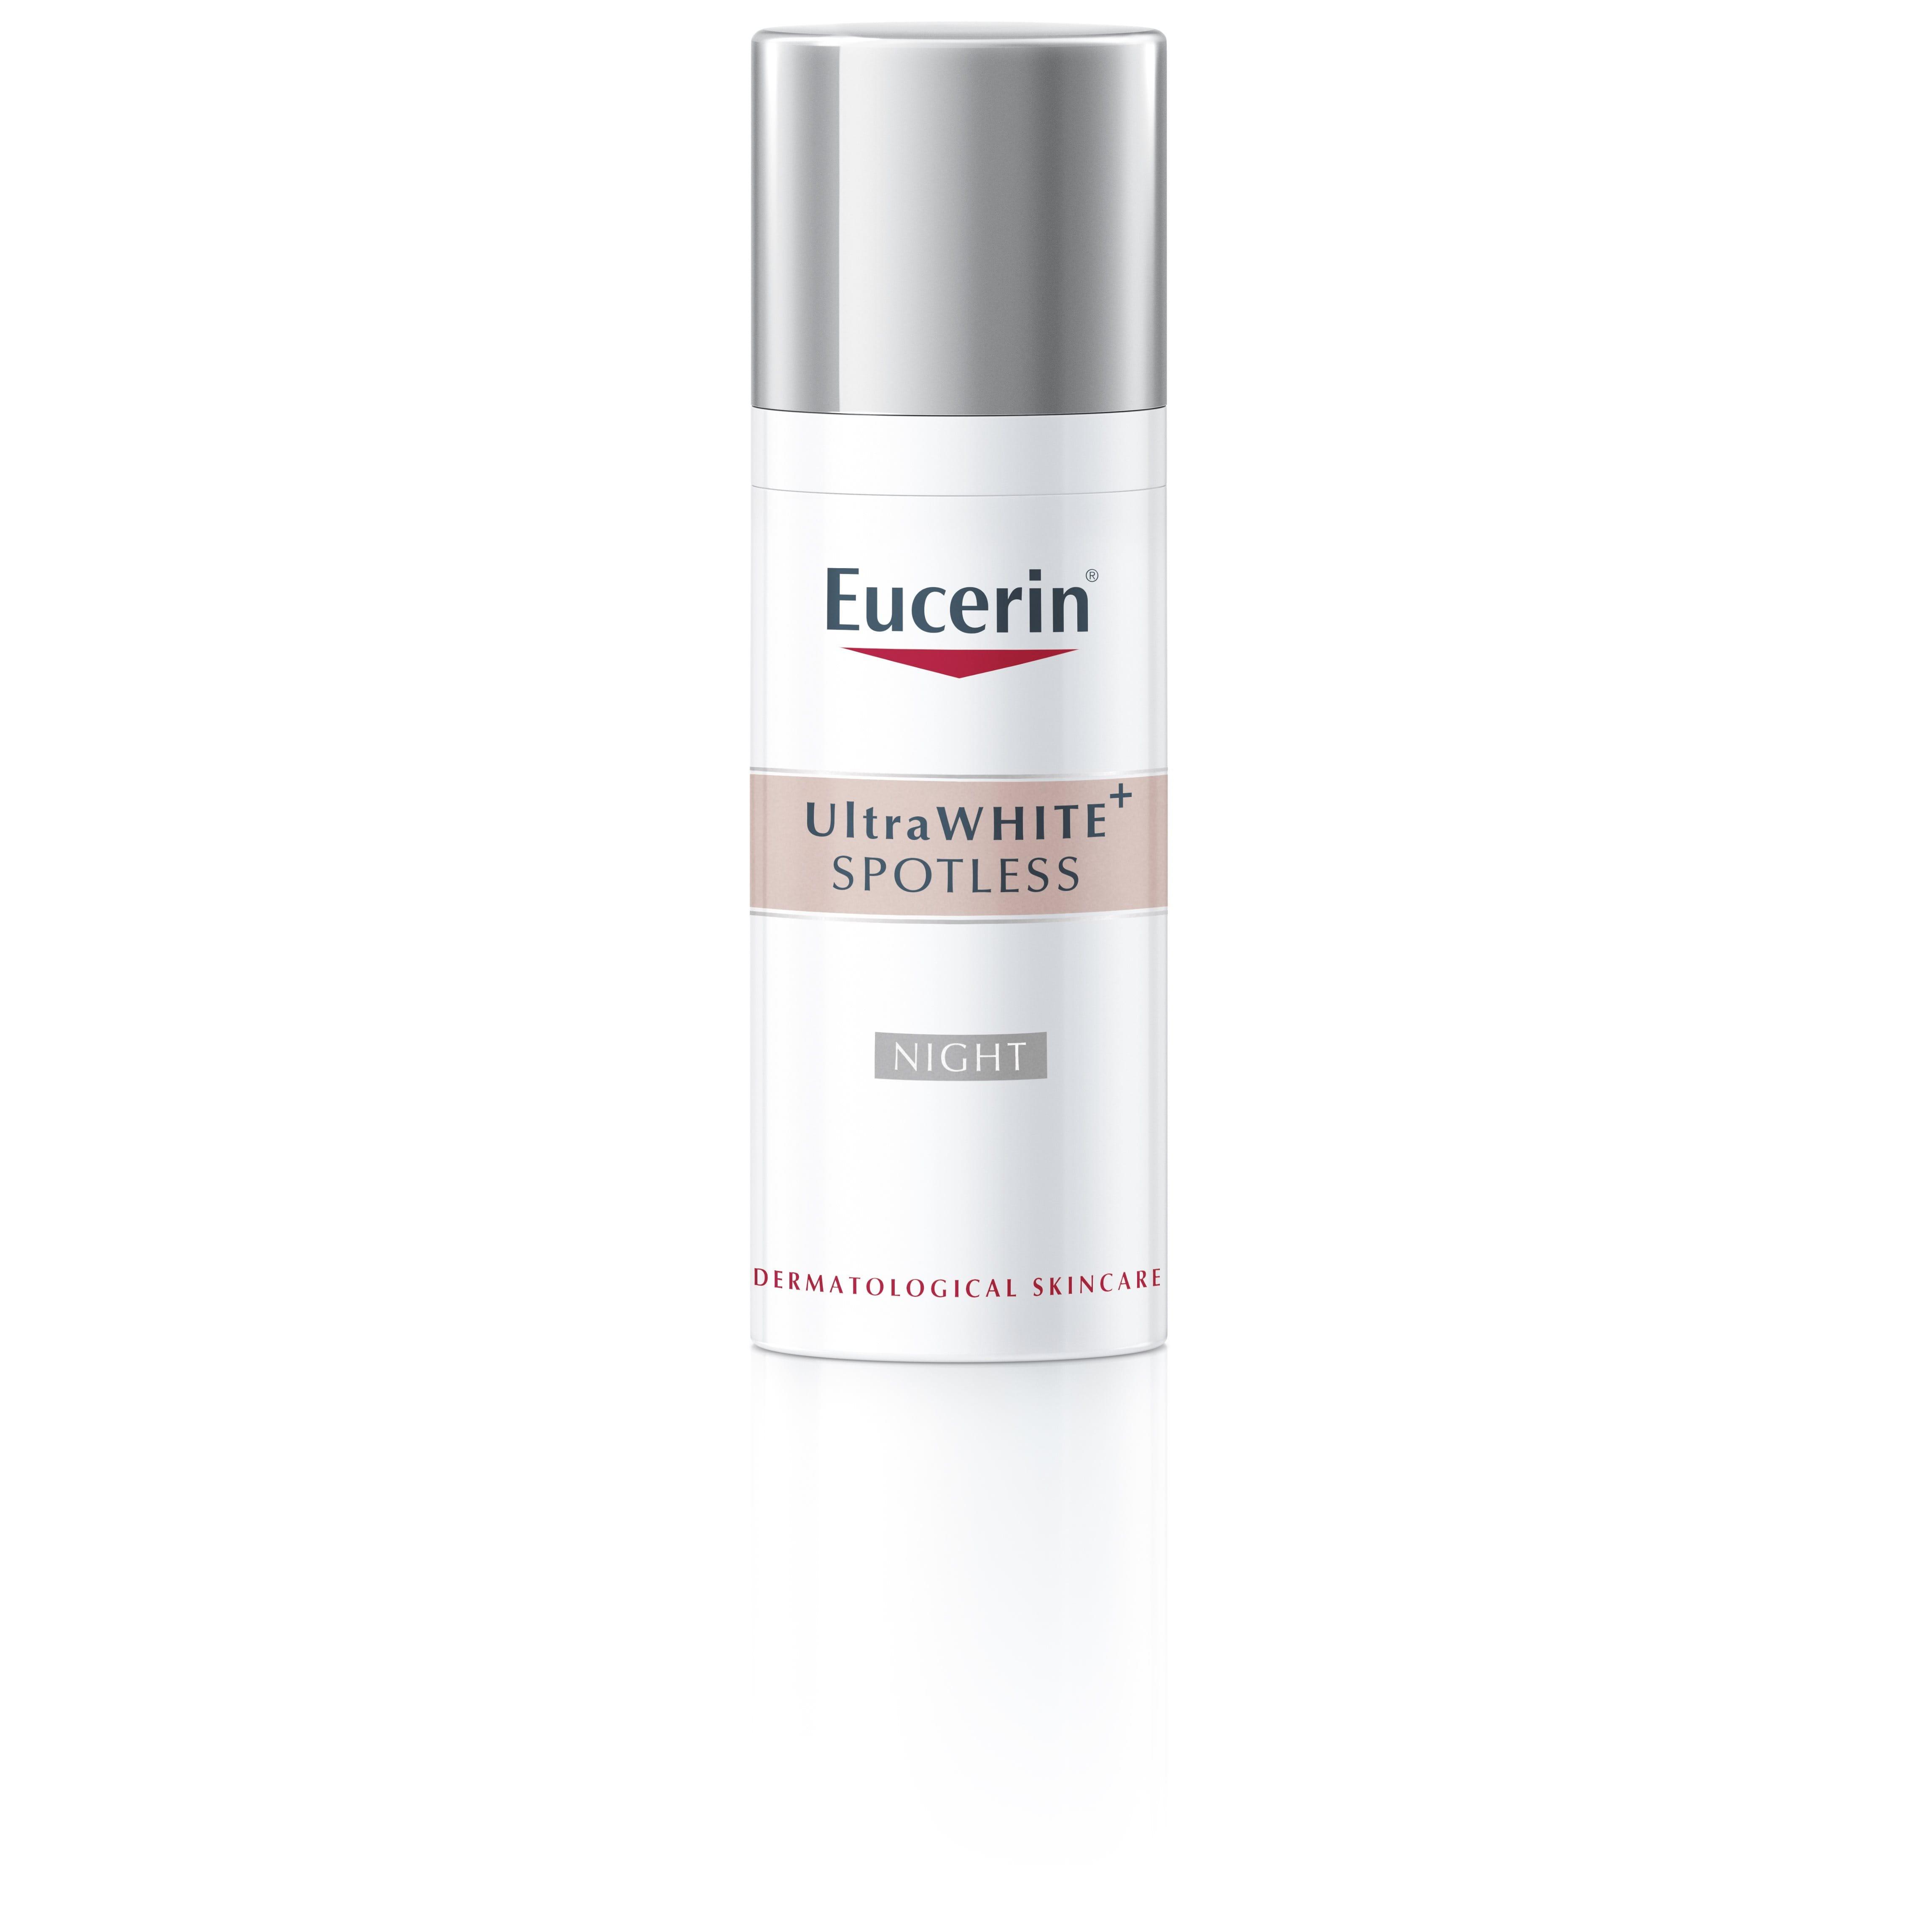 Eucerin Ultrawhite Spotless Night Fluid